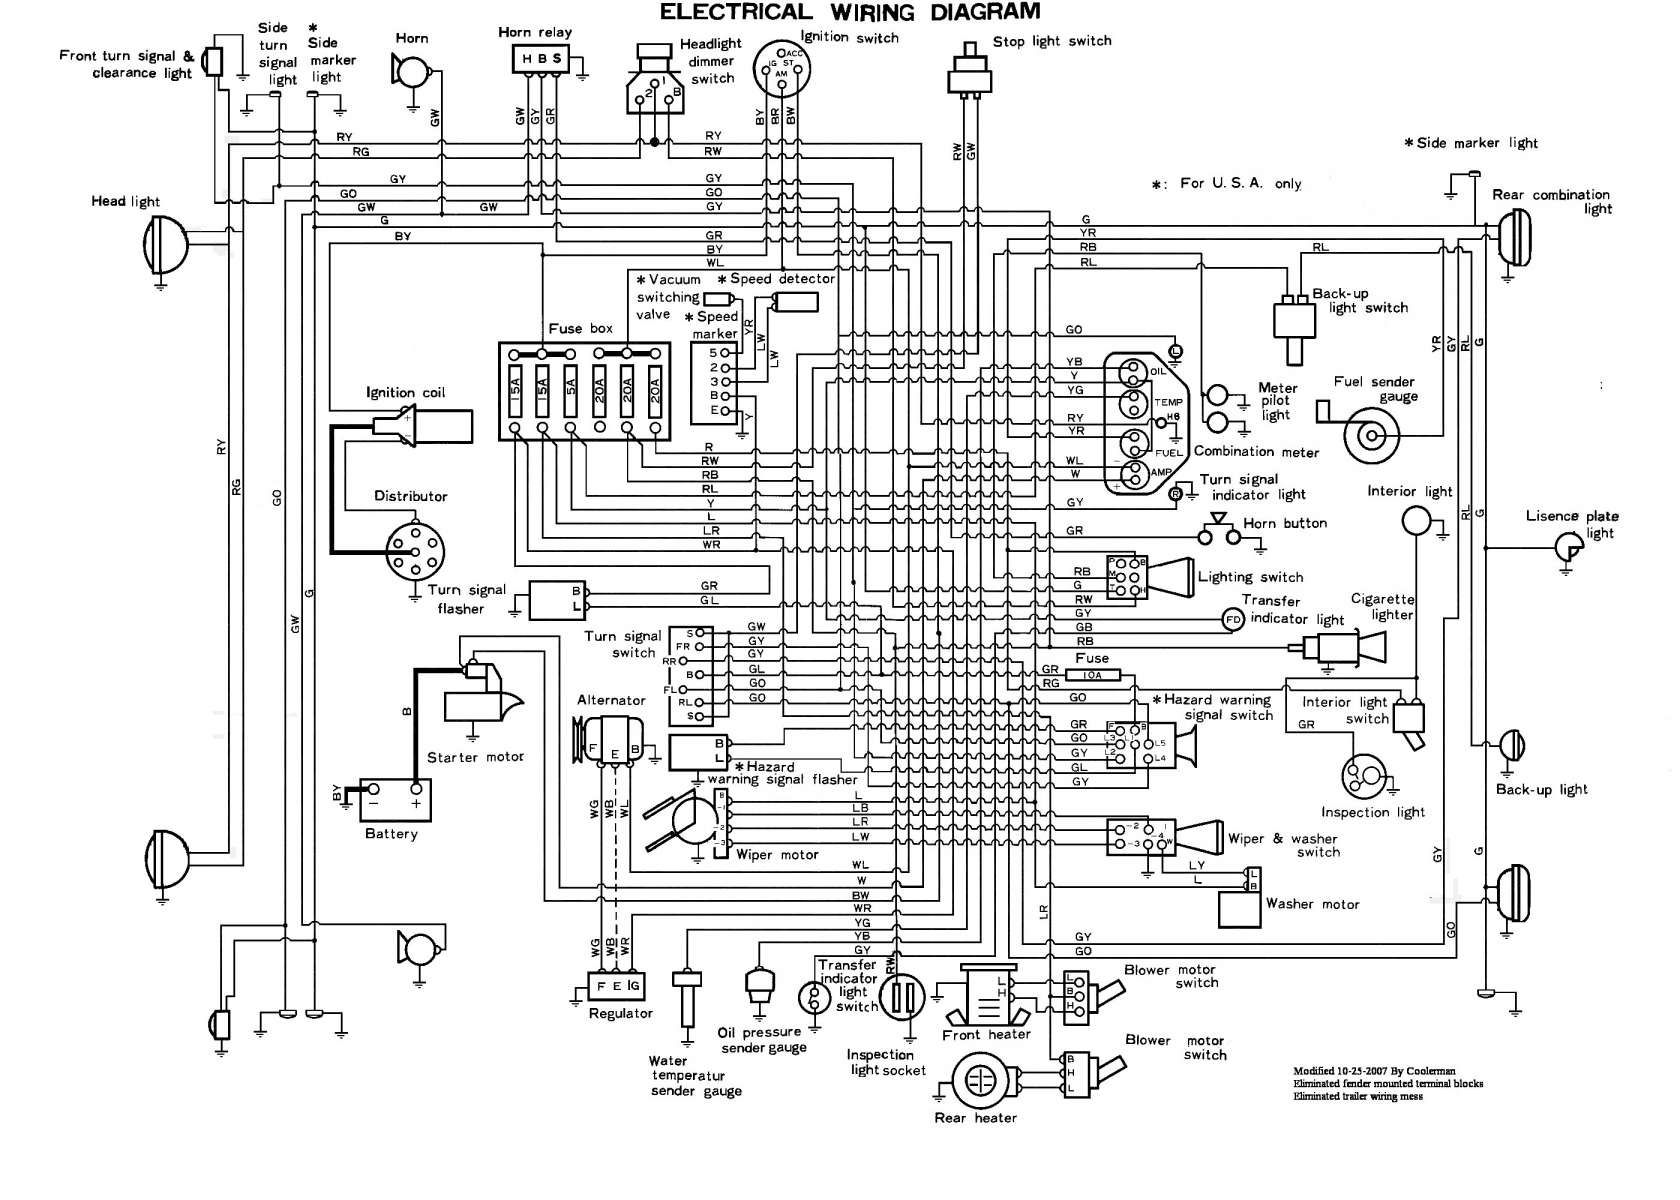 Wiring Diagram For 2006 Pt Cruiser Engine